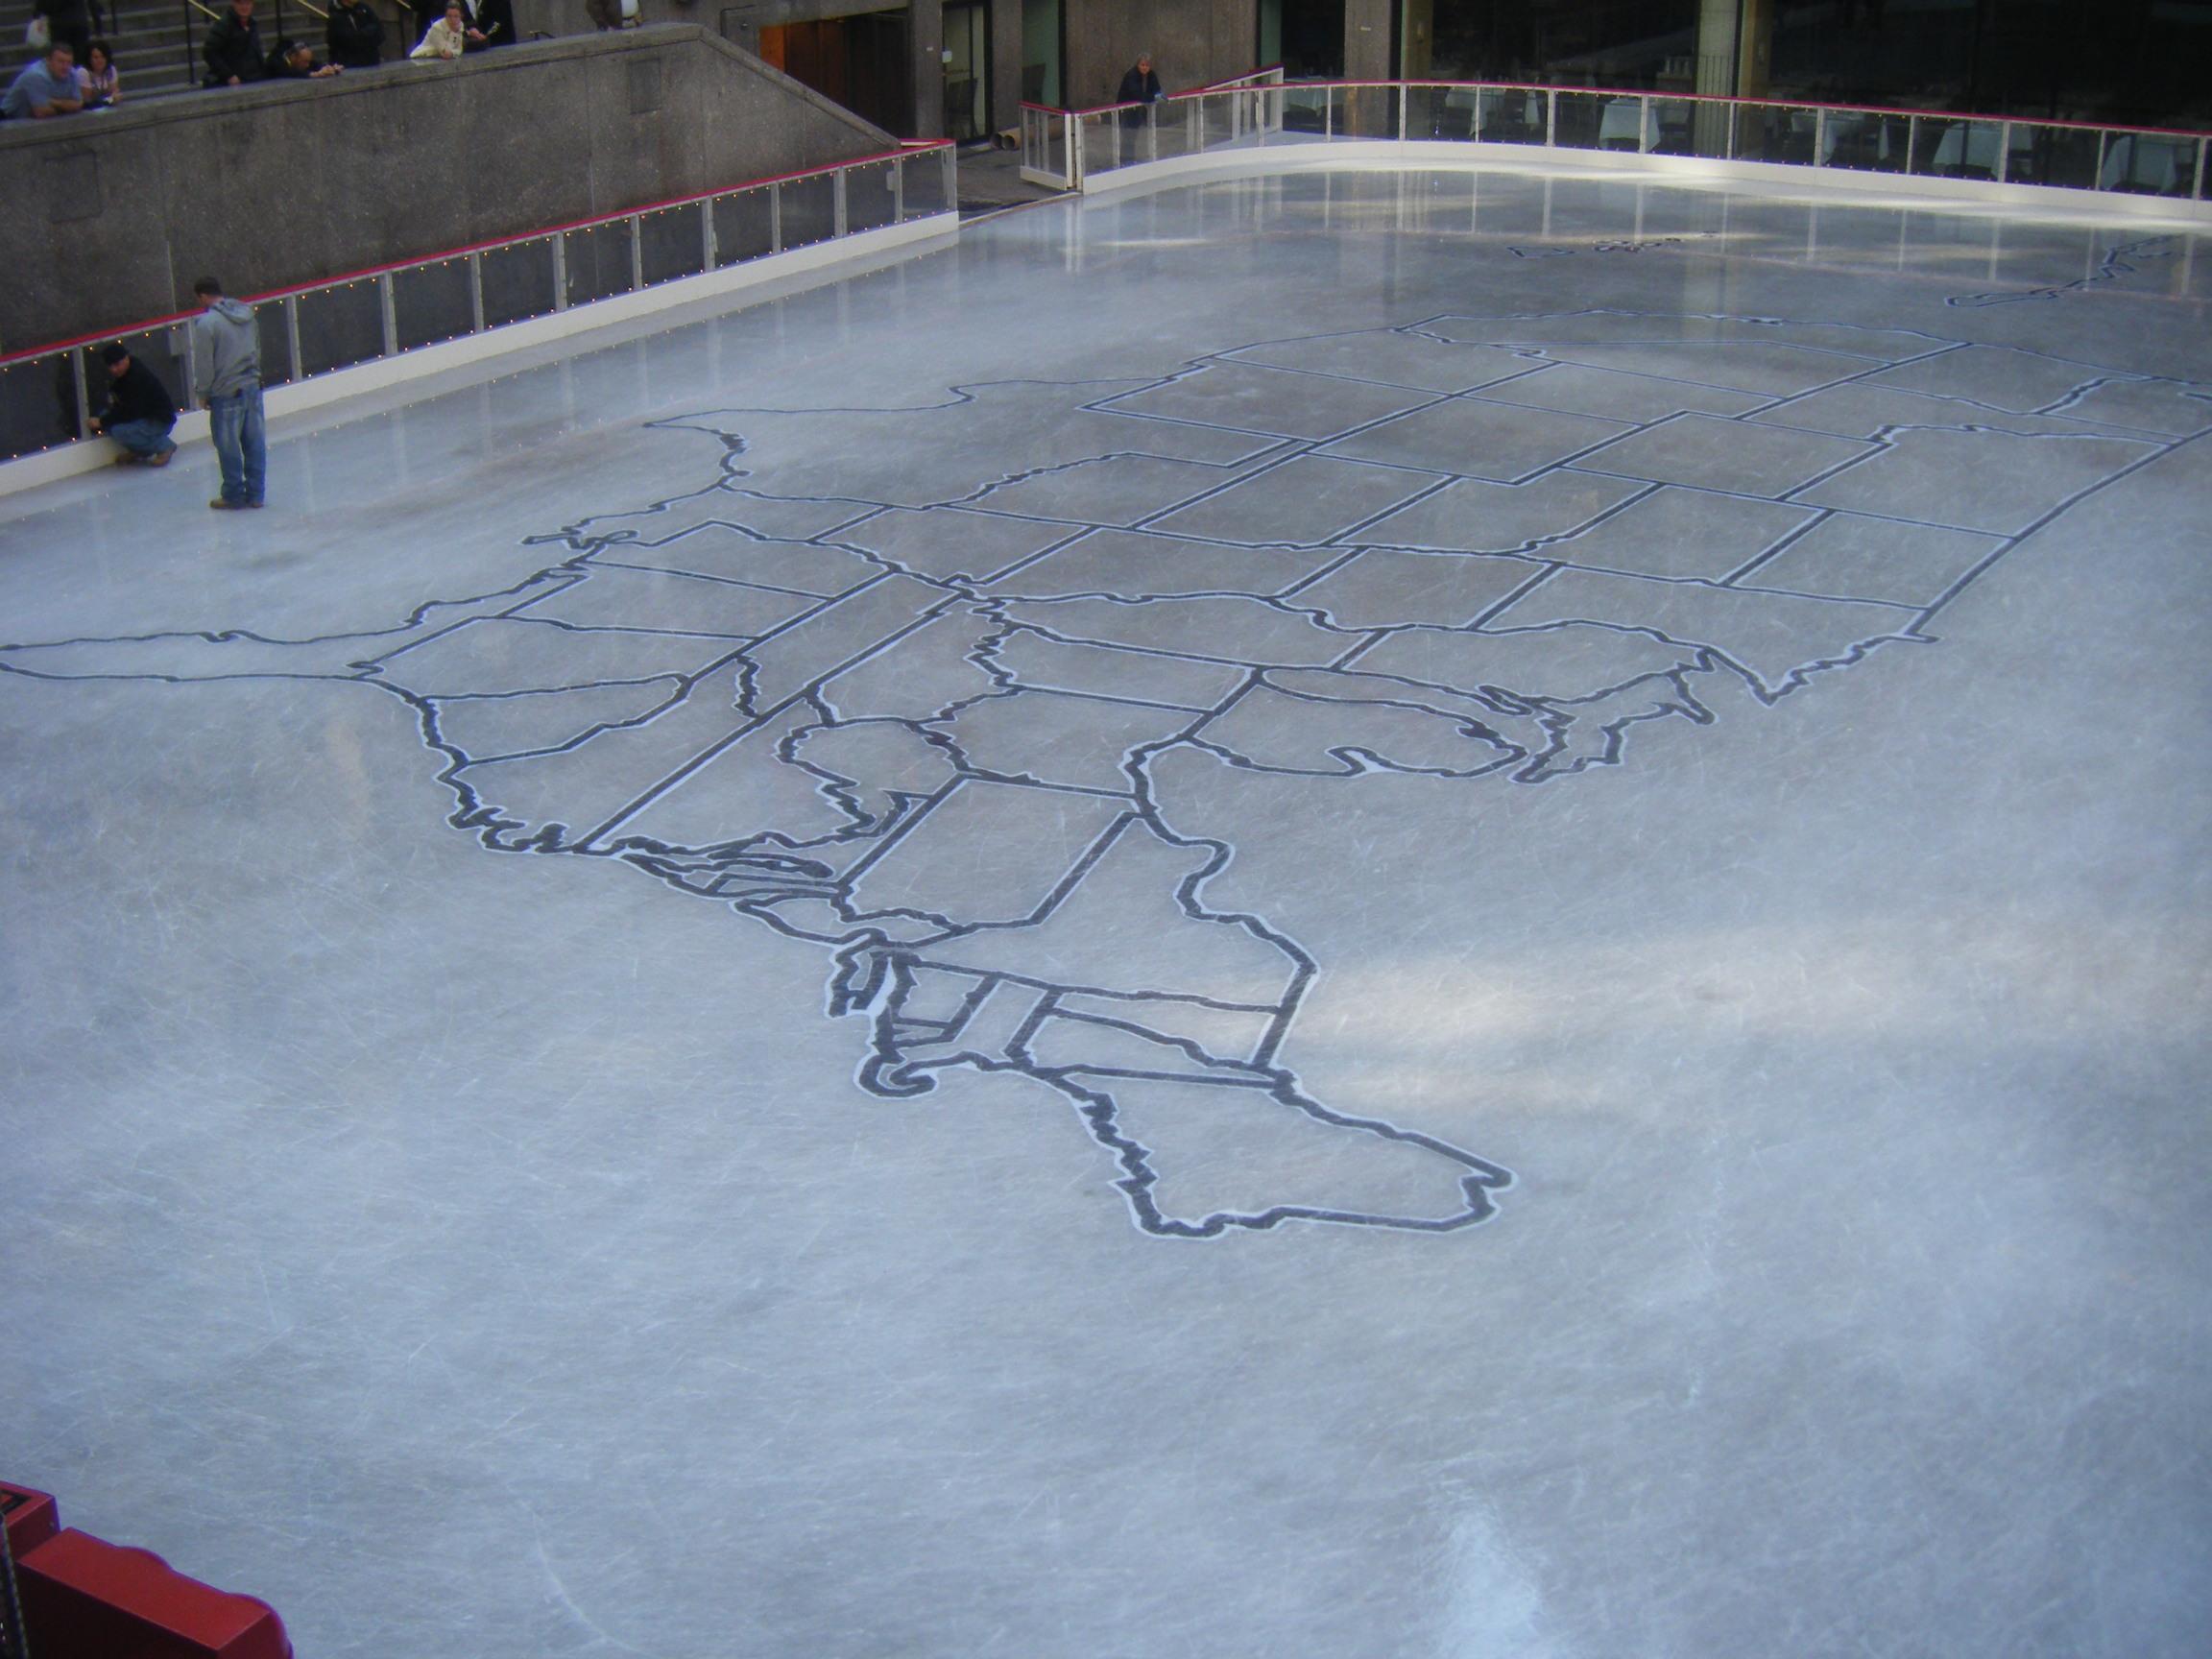 Ice rink clipart wallpaper jpg transparent download Sunset Ice Skating HD wallpaper jpg transparent download